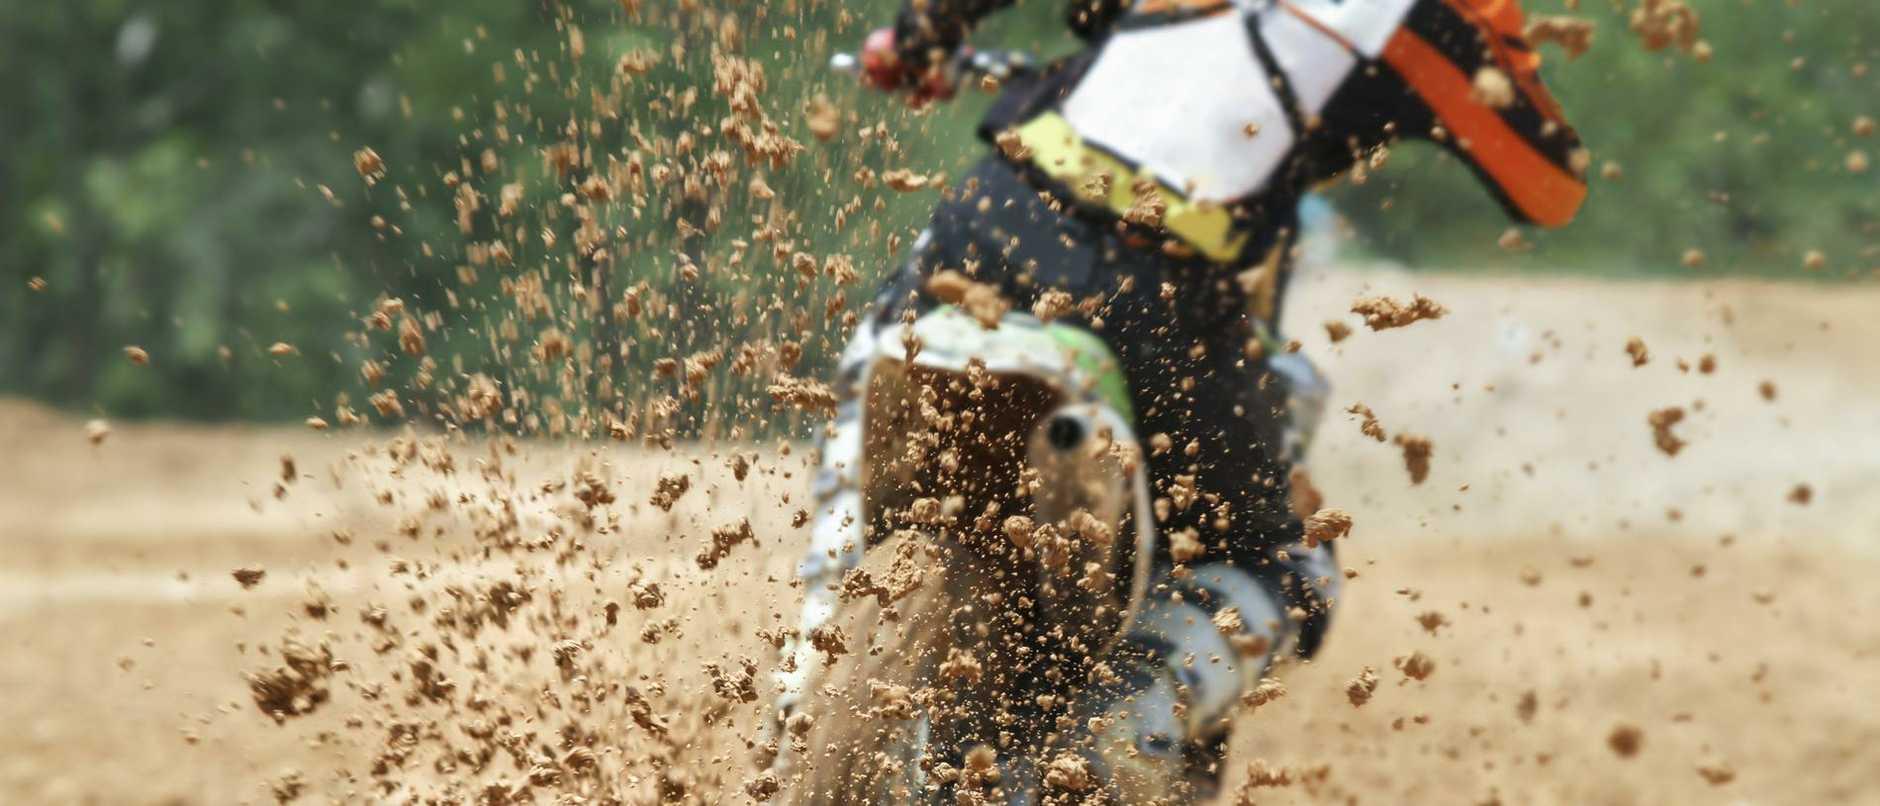 Mud debris flying from a motocross race